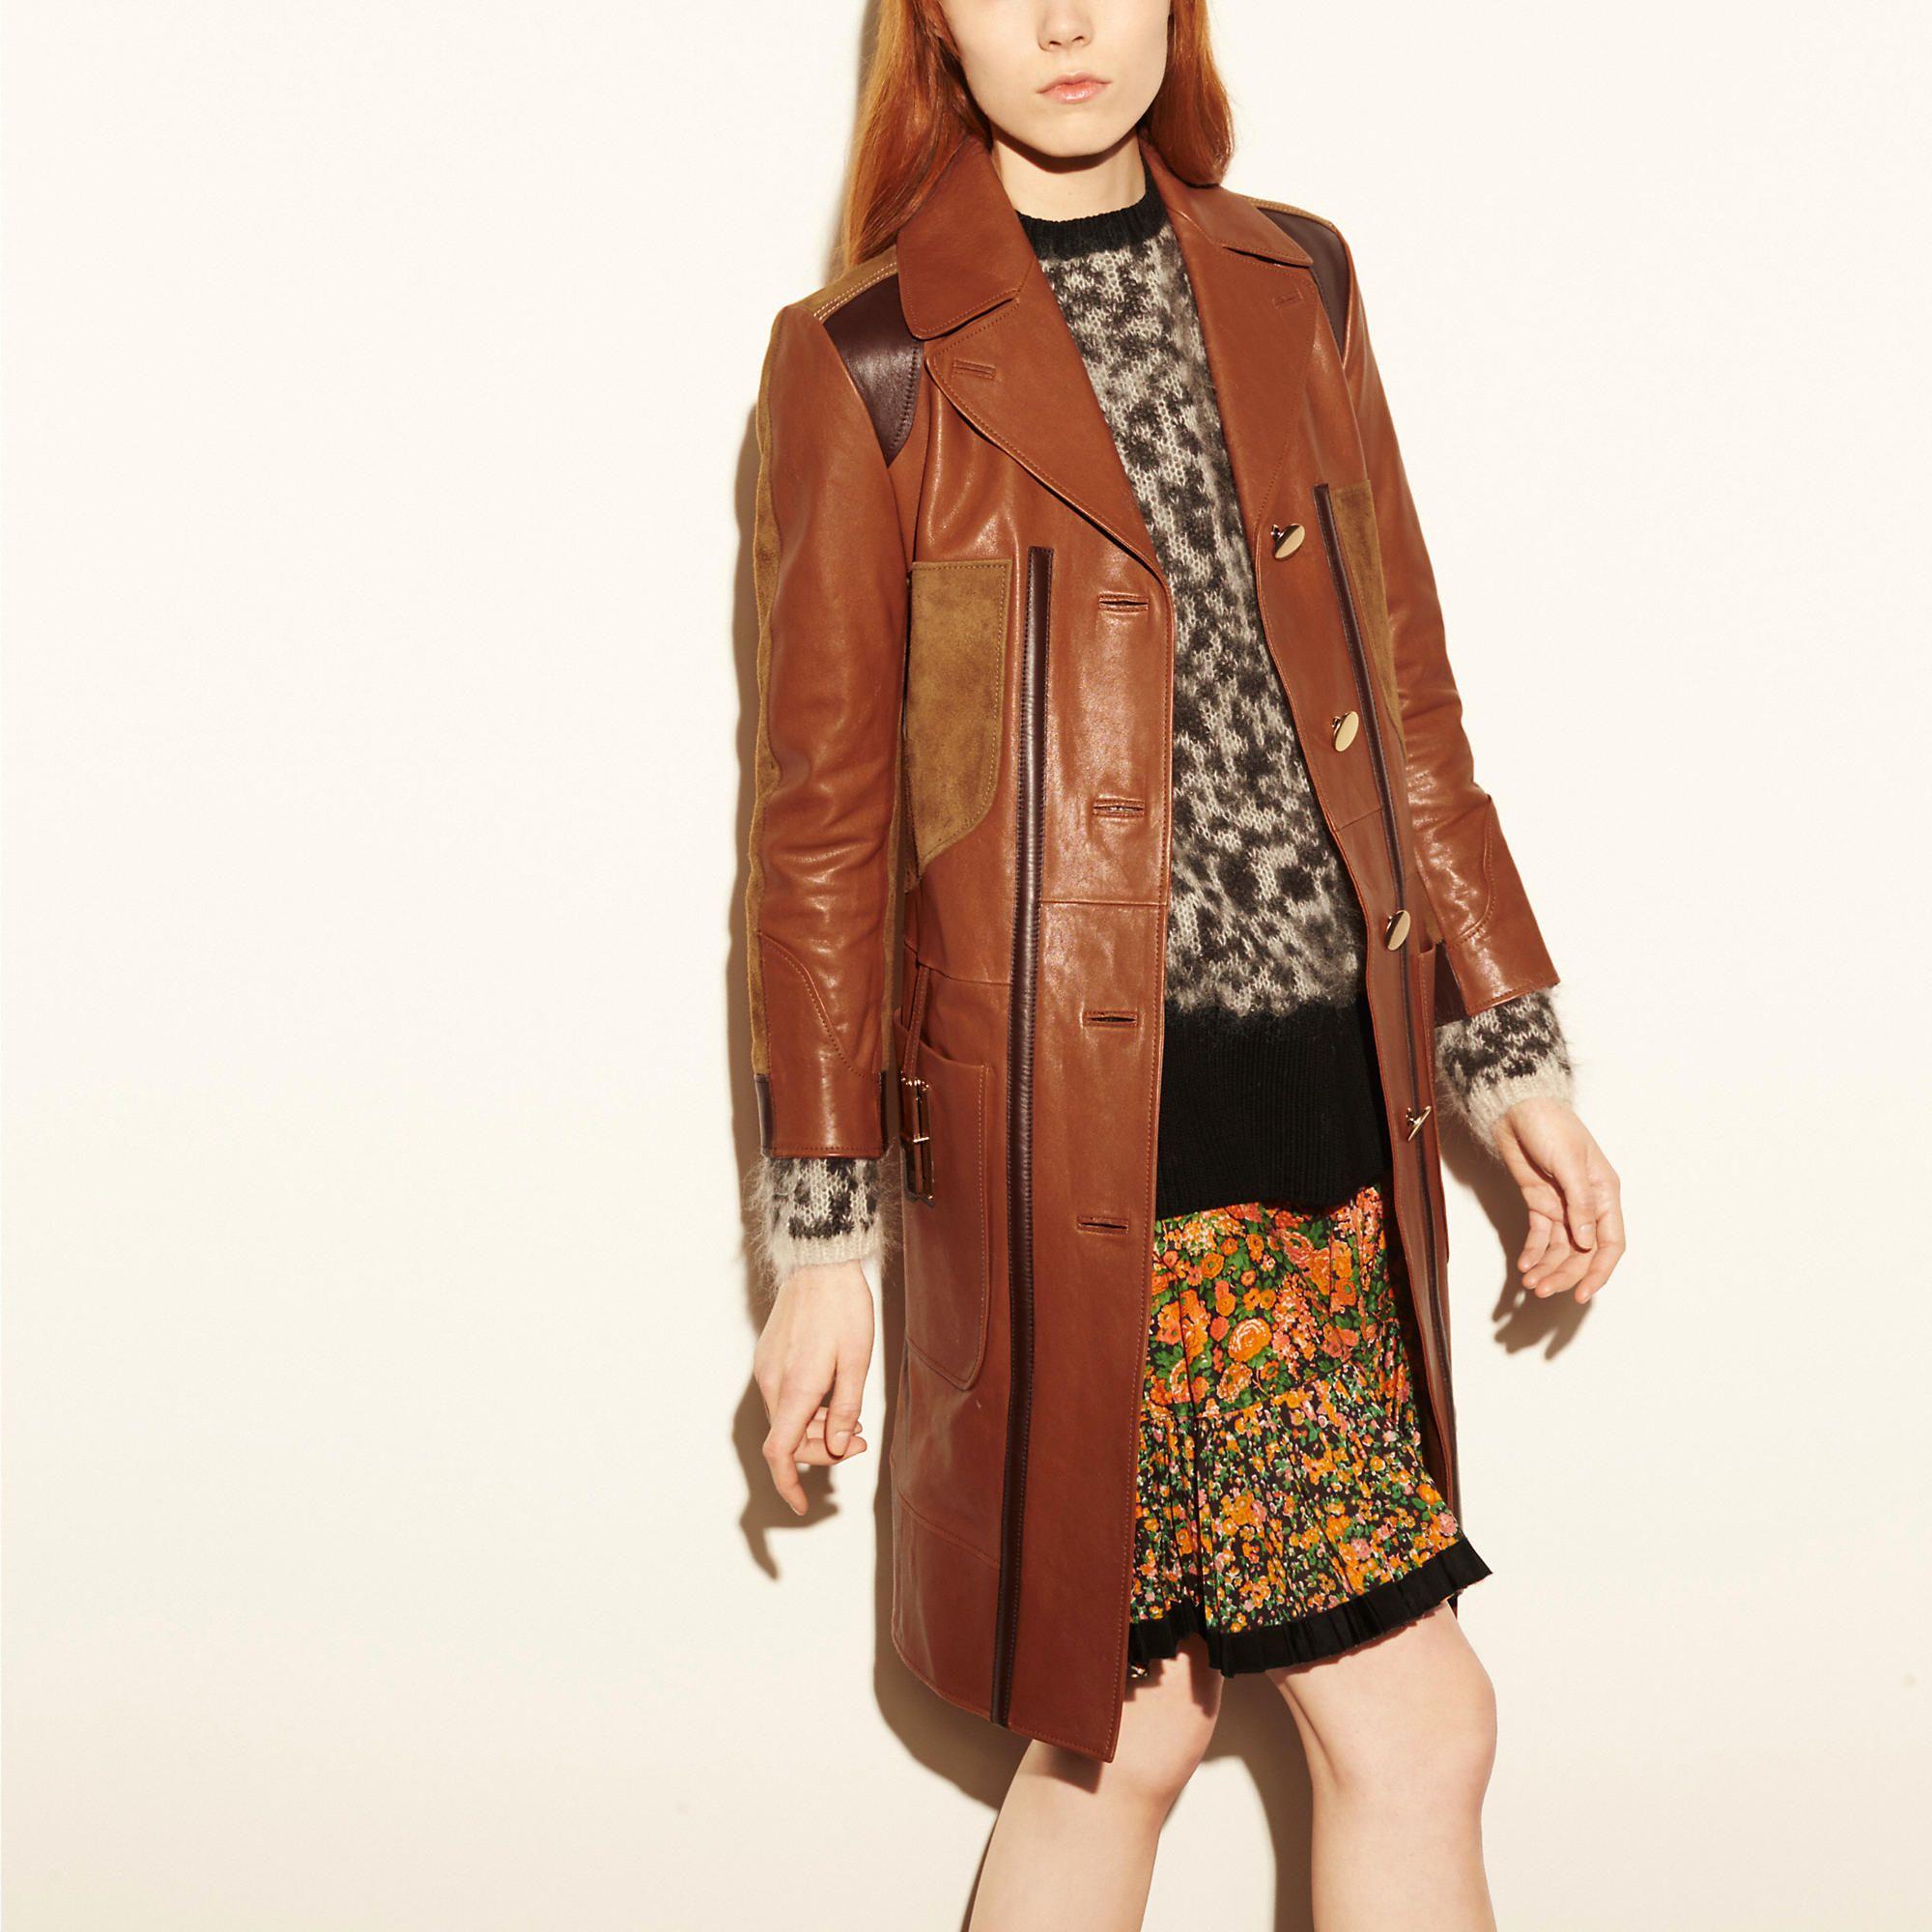 COACH 1941 Combo Leather Coat Women's Outerwear